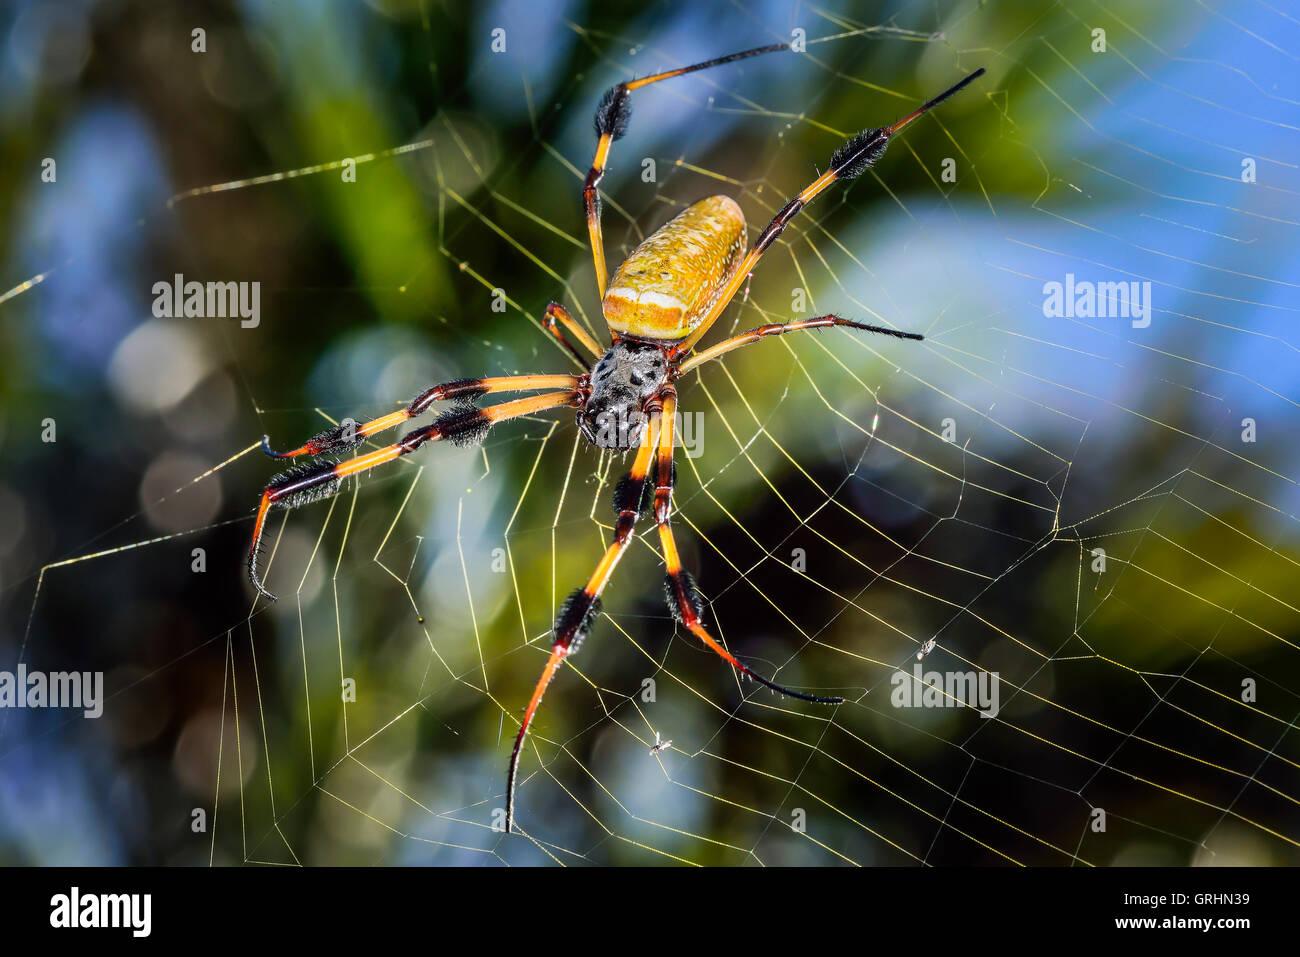 Golden Orb-Web Spider - Stock Image